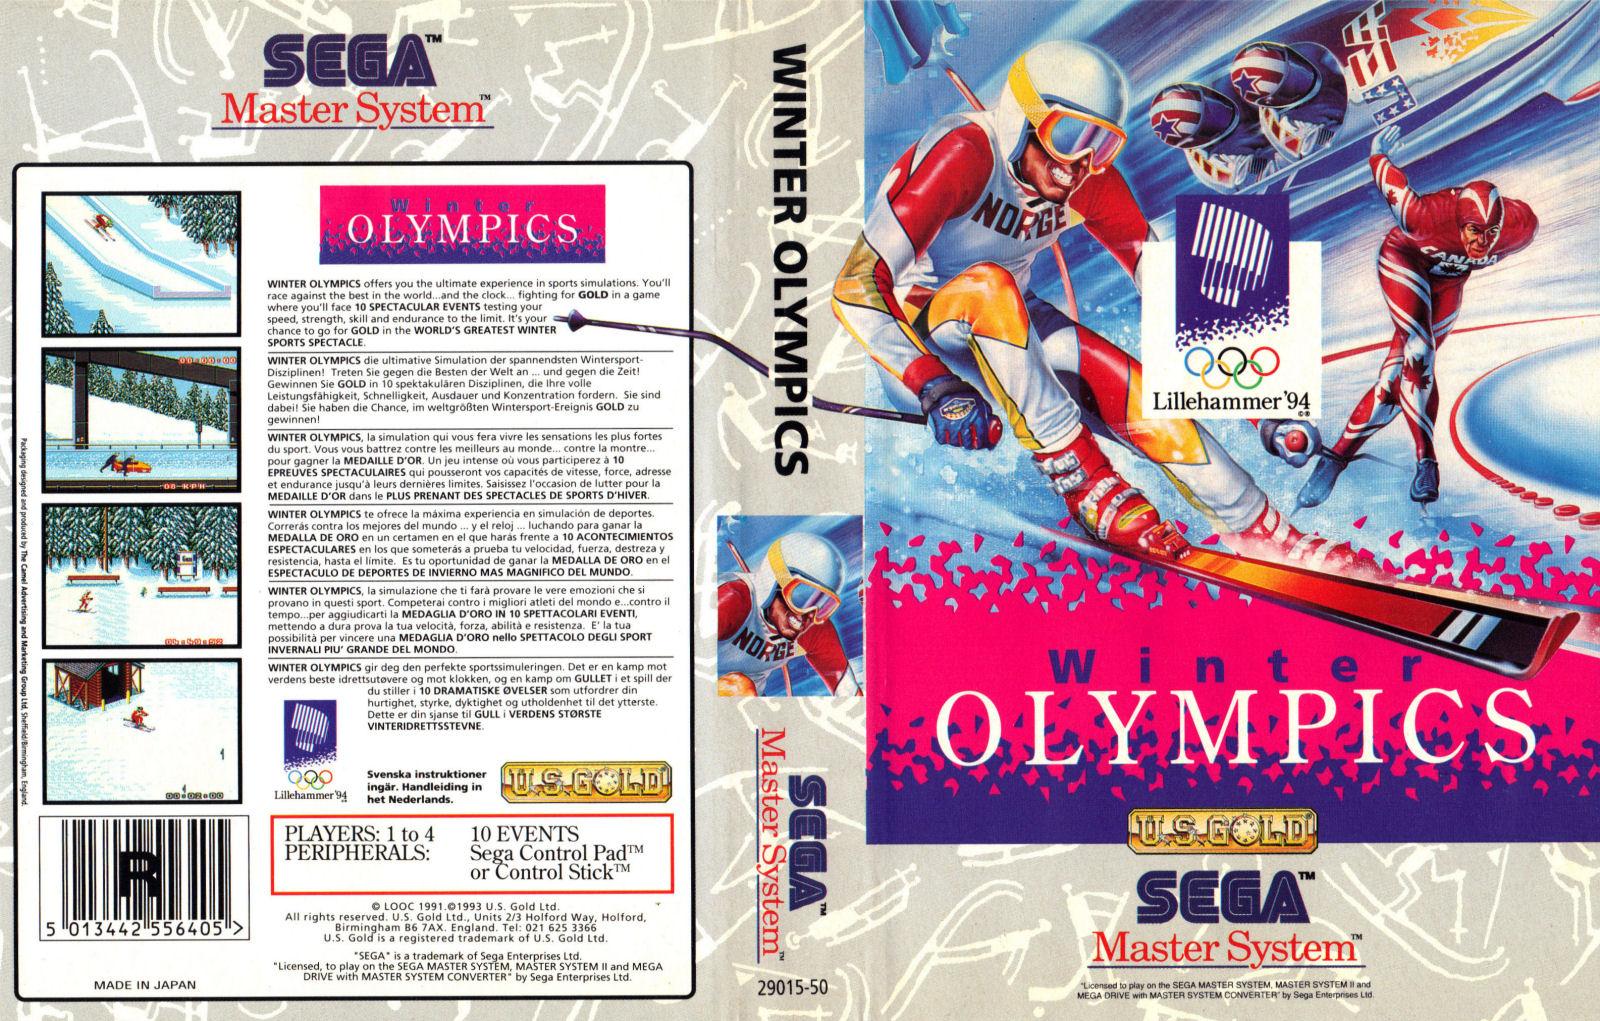 http://www.smspower.org/uploads/Scans/WinterOlympics-SMS-EU.jpg